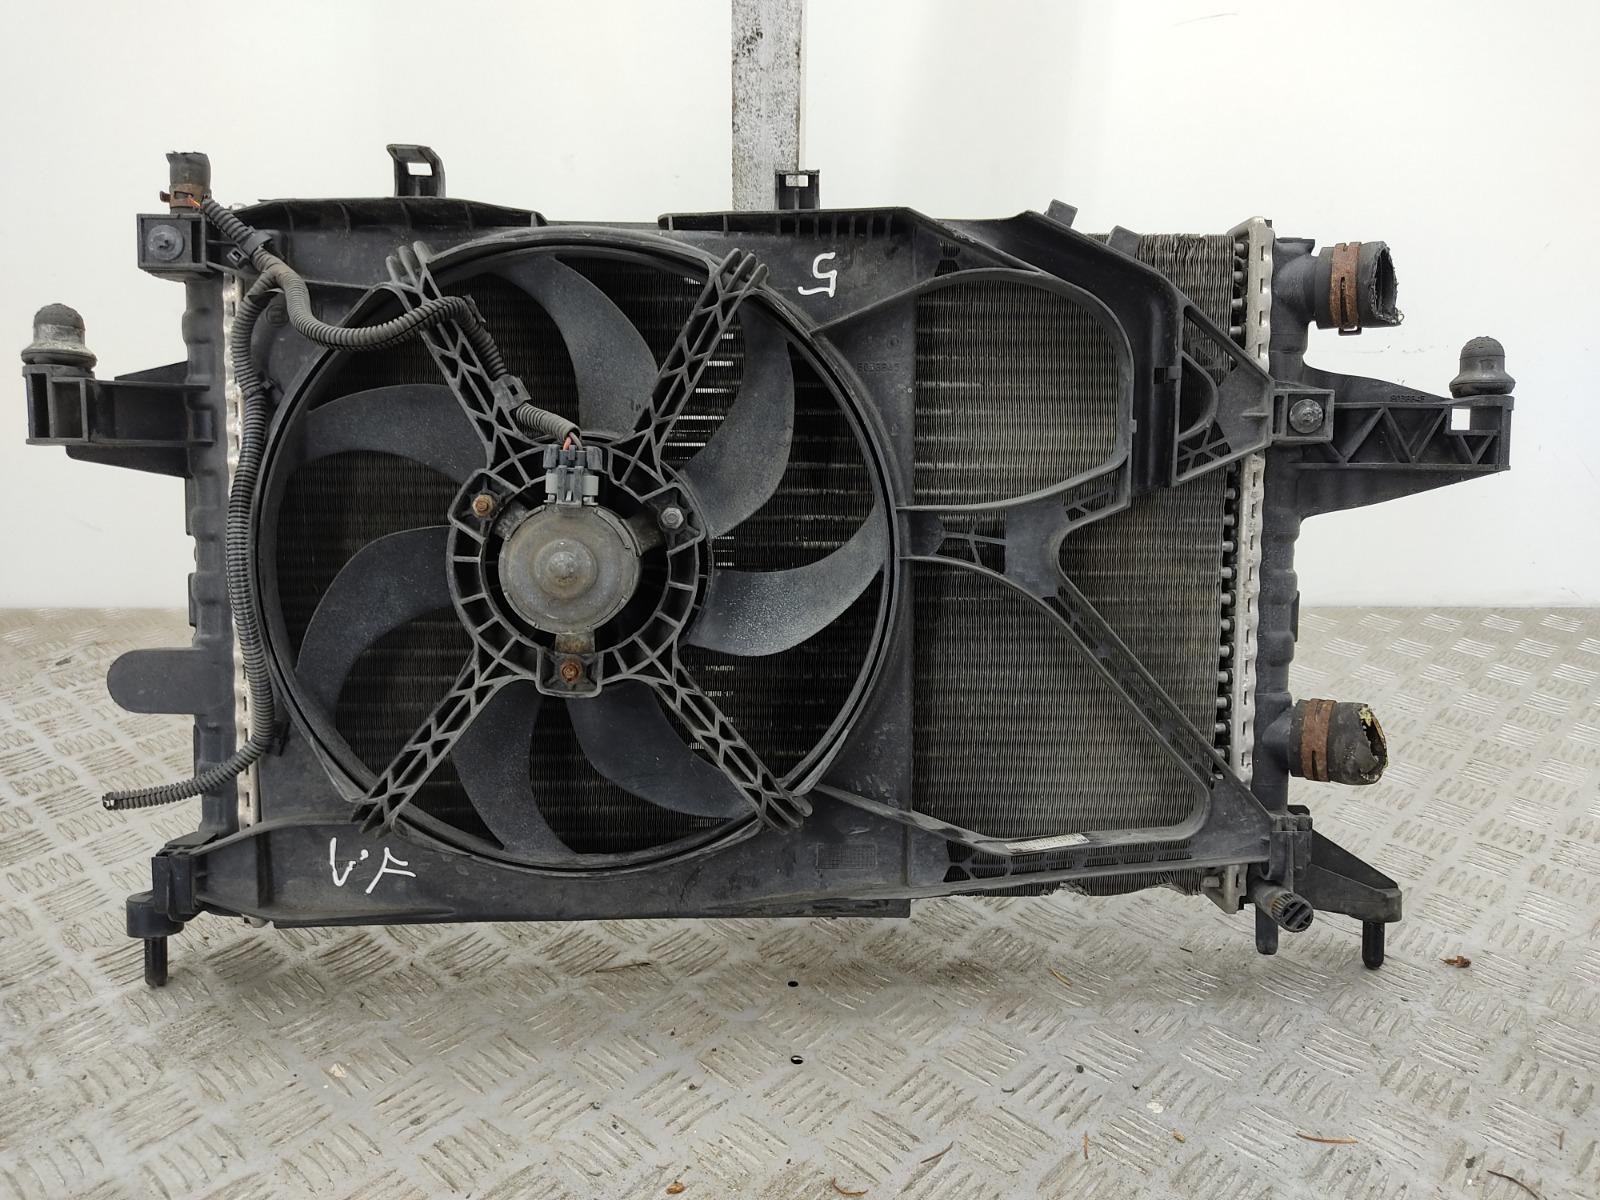 Кассета радиаторов Opel Corsa C 1.2 I 2006 (б/у)